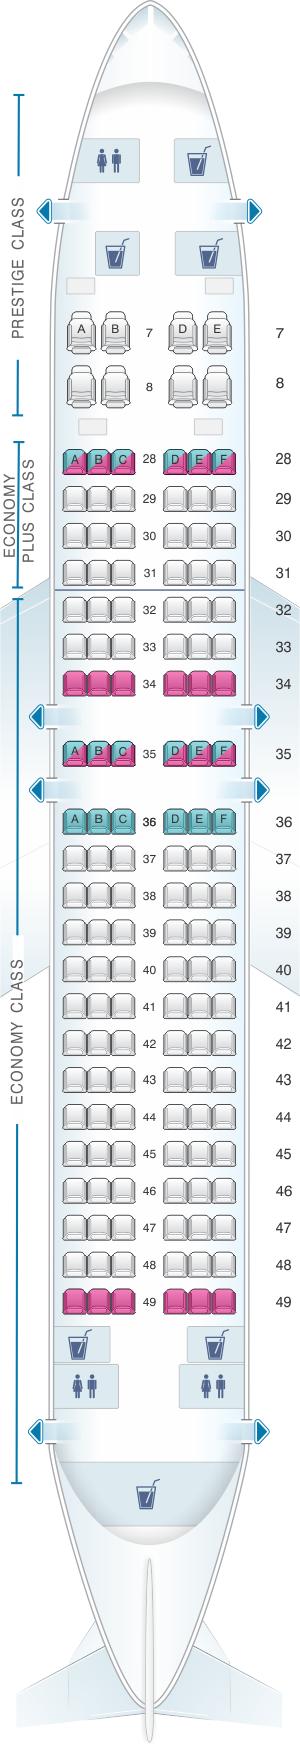 Seat map for Korean Air Boeing 737 MAX8